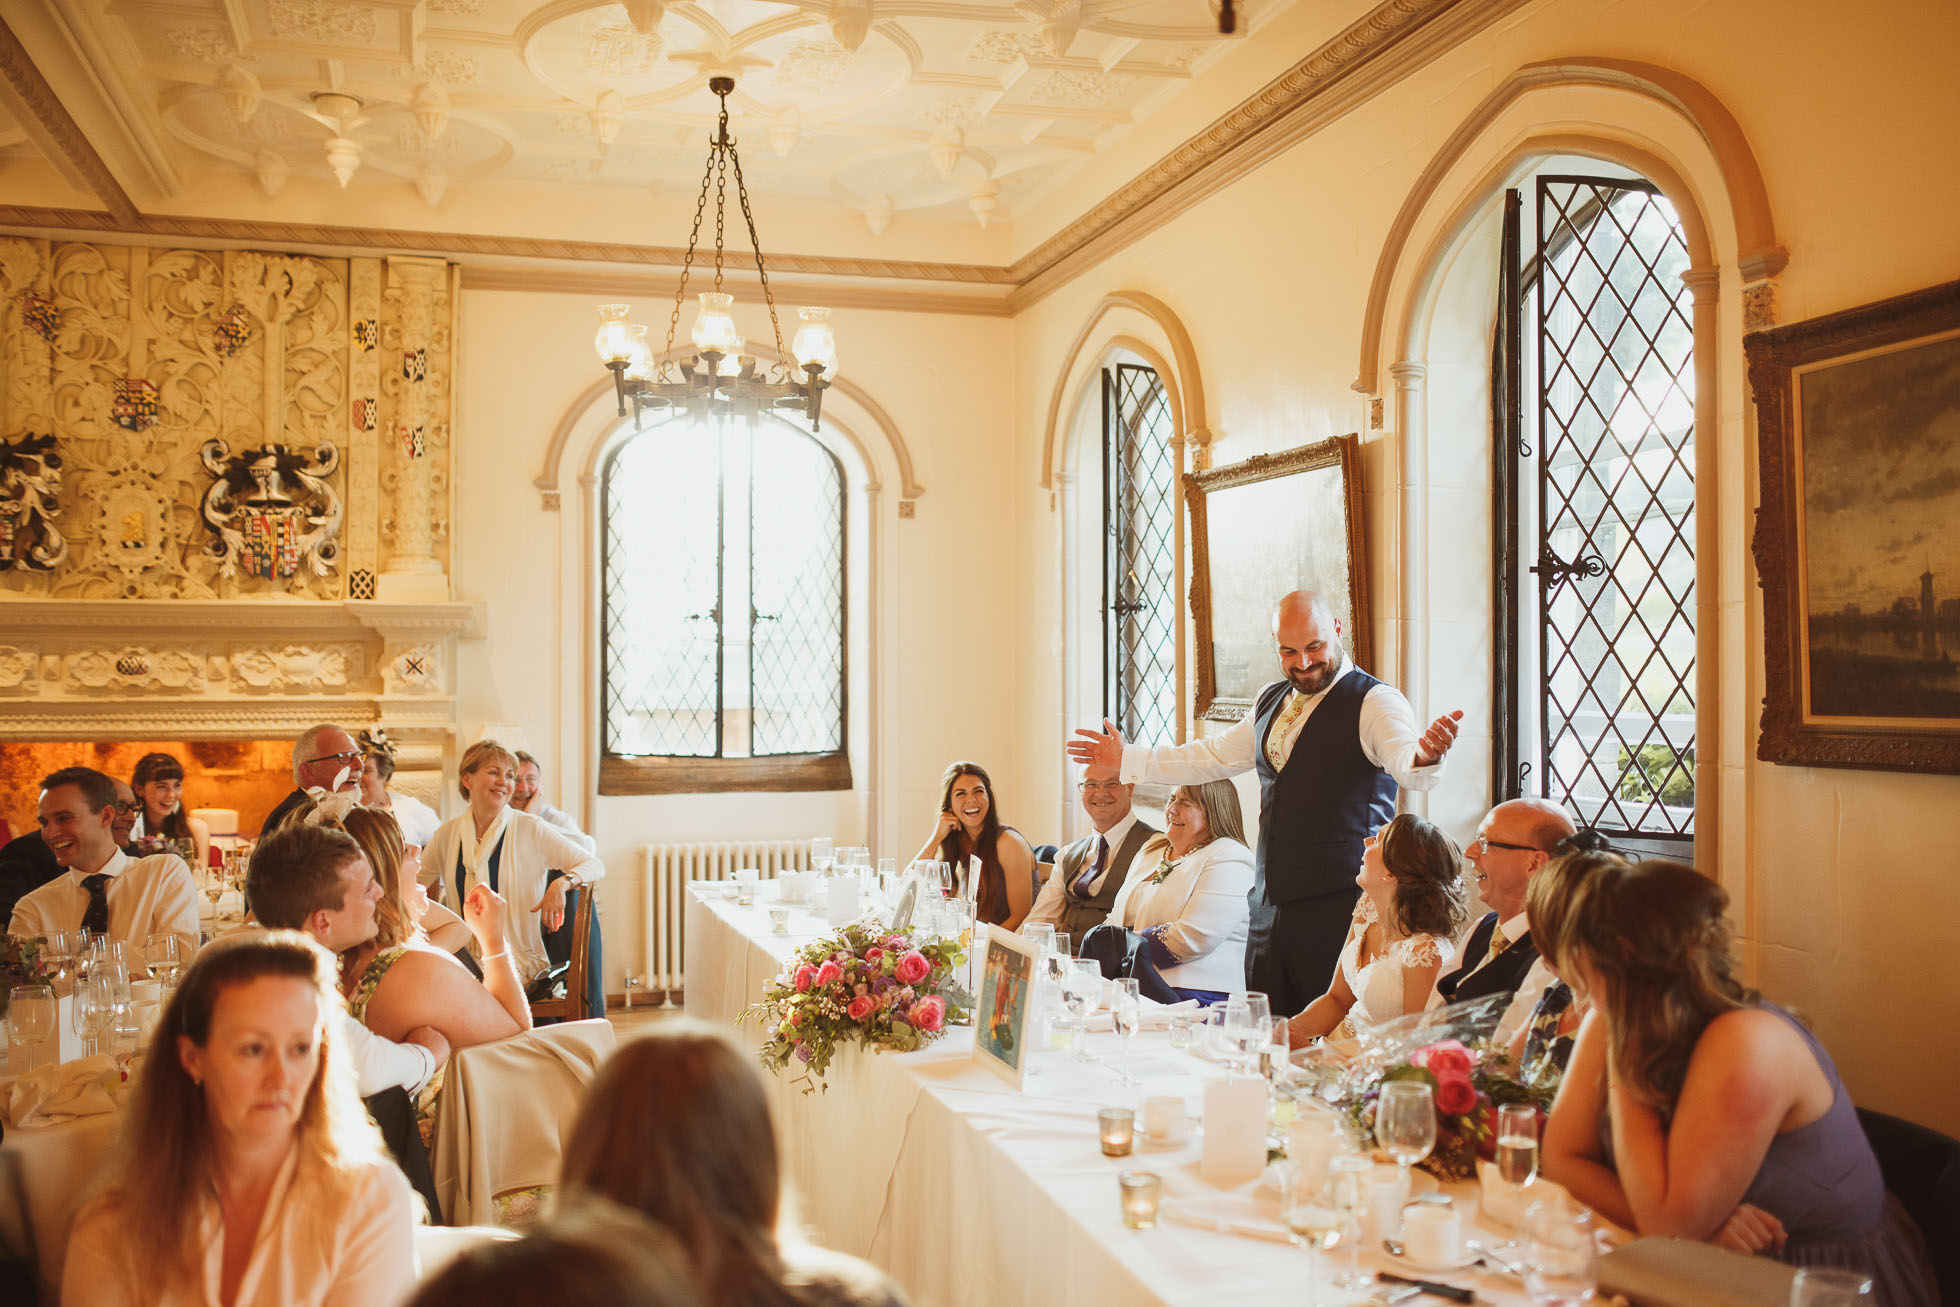 denton-hall-wedding-photographer-56.jpg